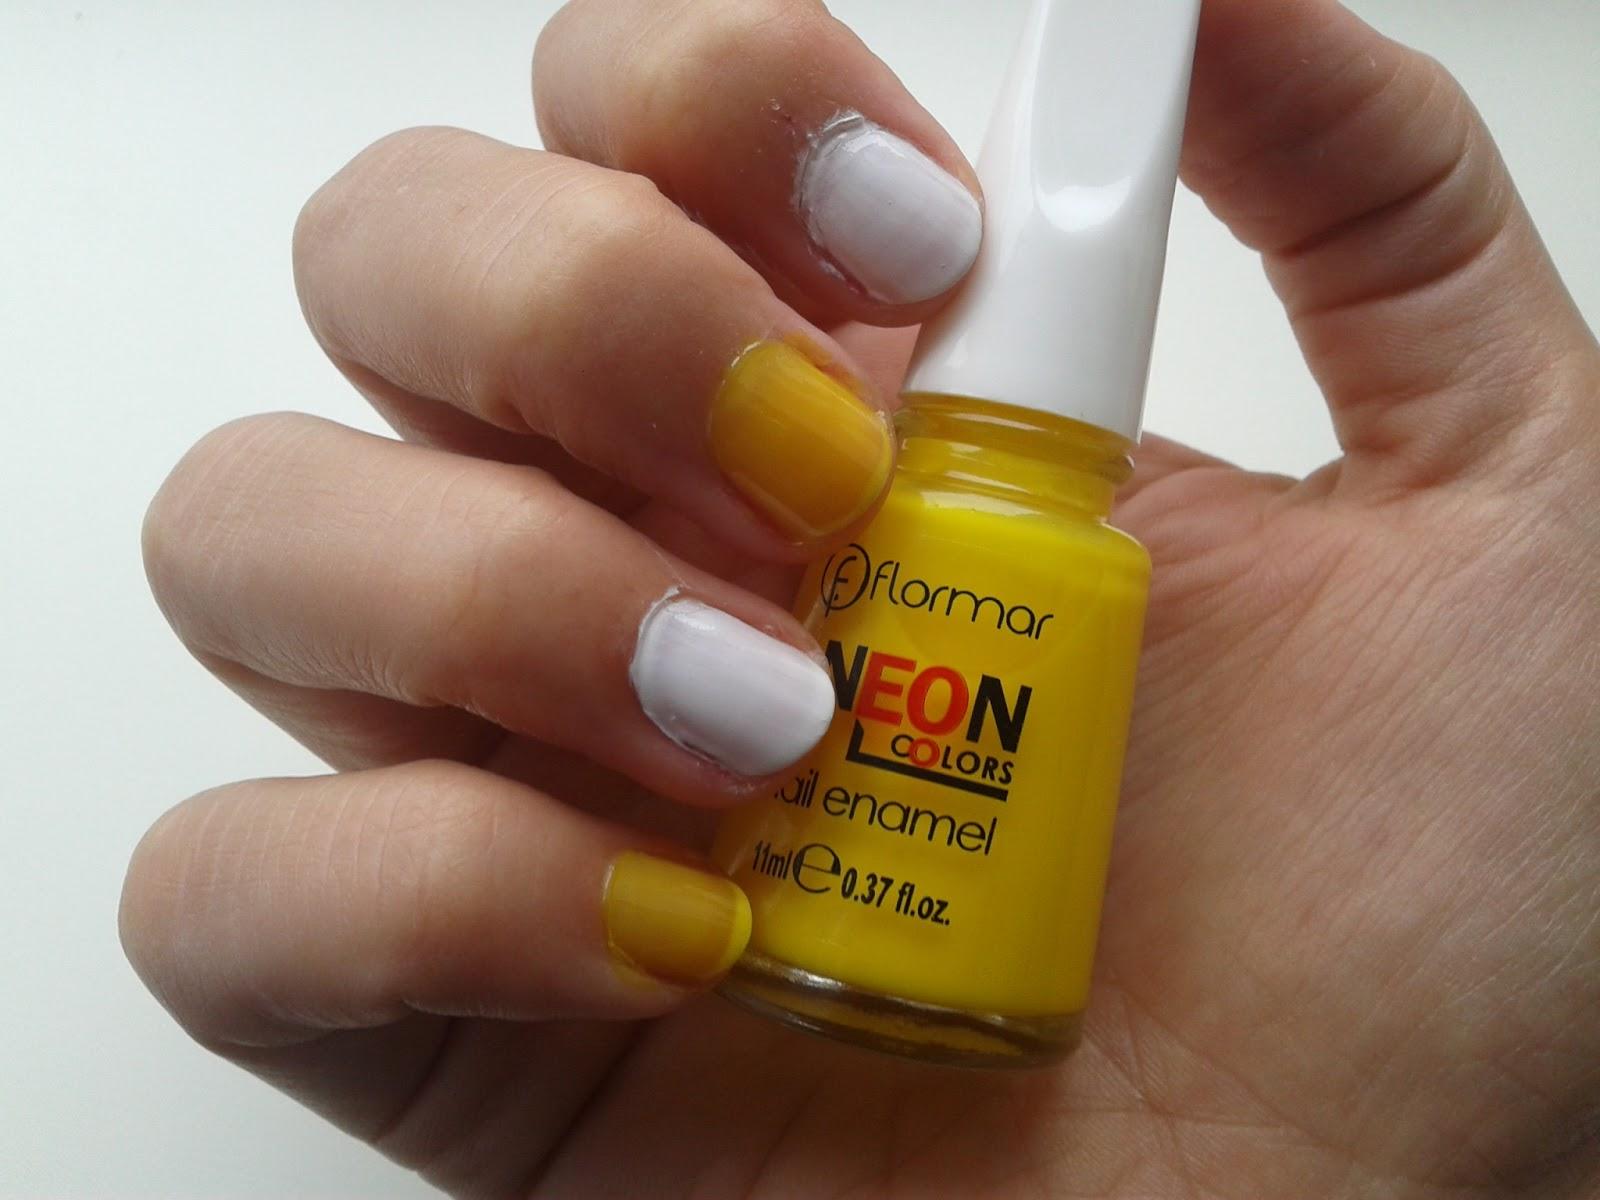 Somewhere I Belong: Flomar neon yellow nail polish